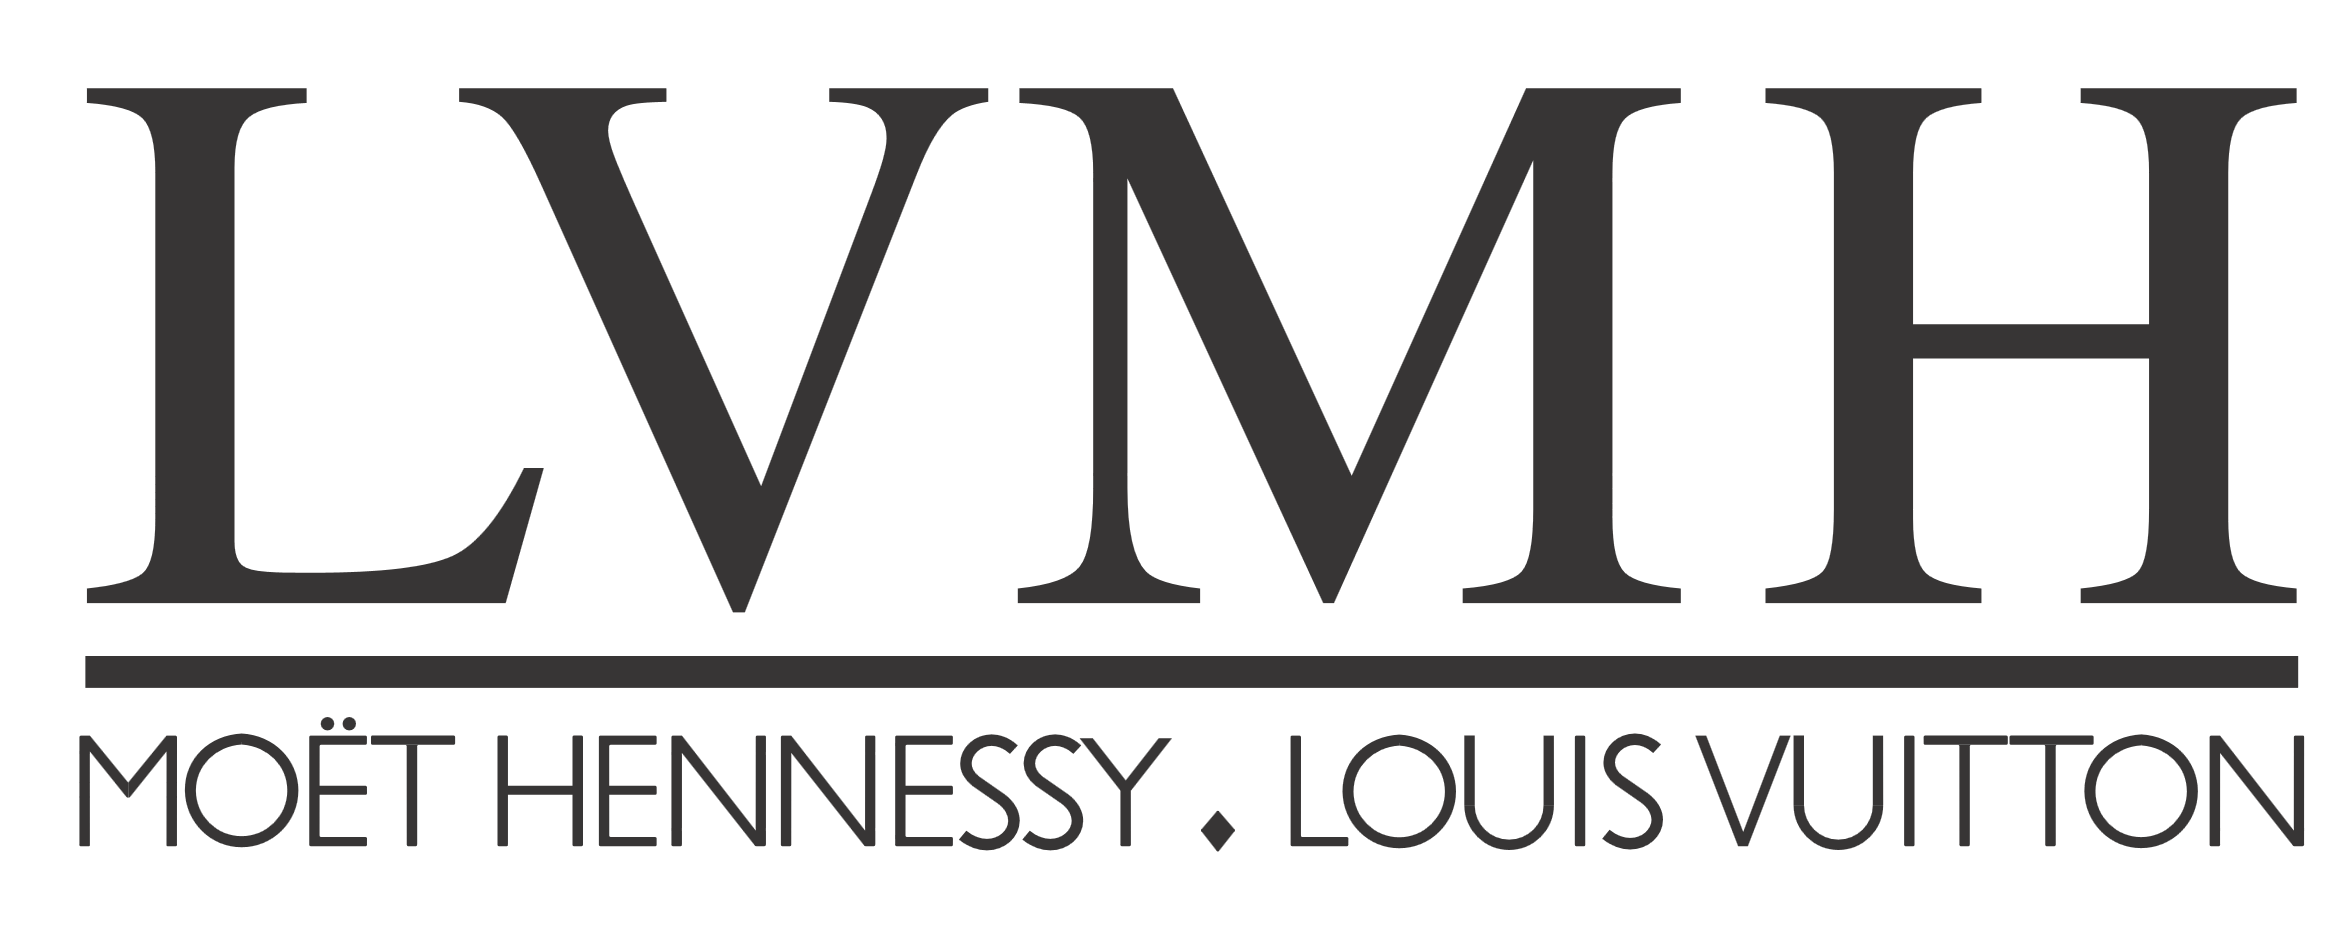 LVMH_logo_logotype_Moët_Hennessy_Louis_Vuitton.jpg